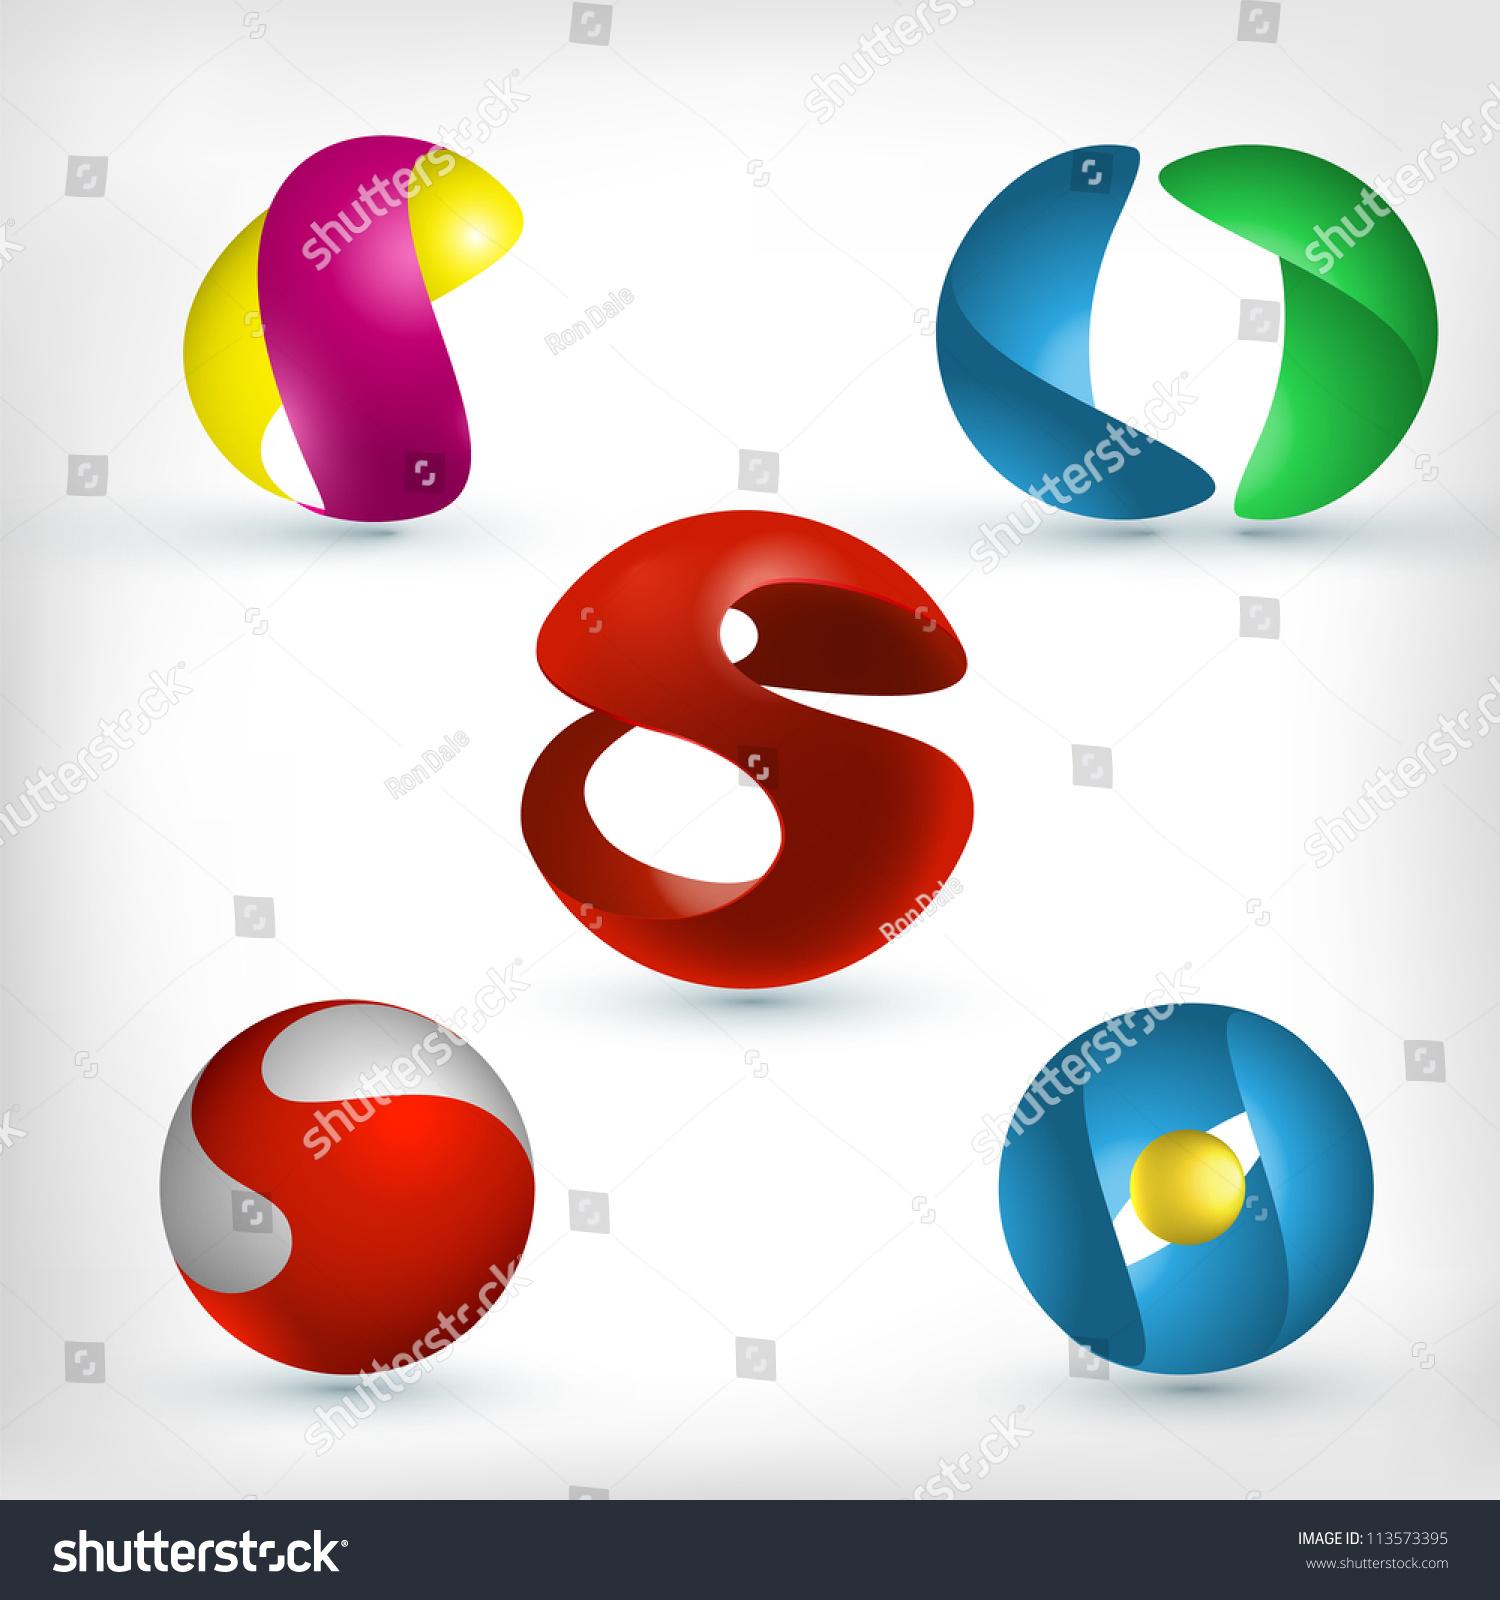 abstract 3d sphere logos carving set stock vector Ball Vector vector spherical harmonics on fermi surfaces